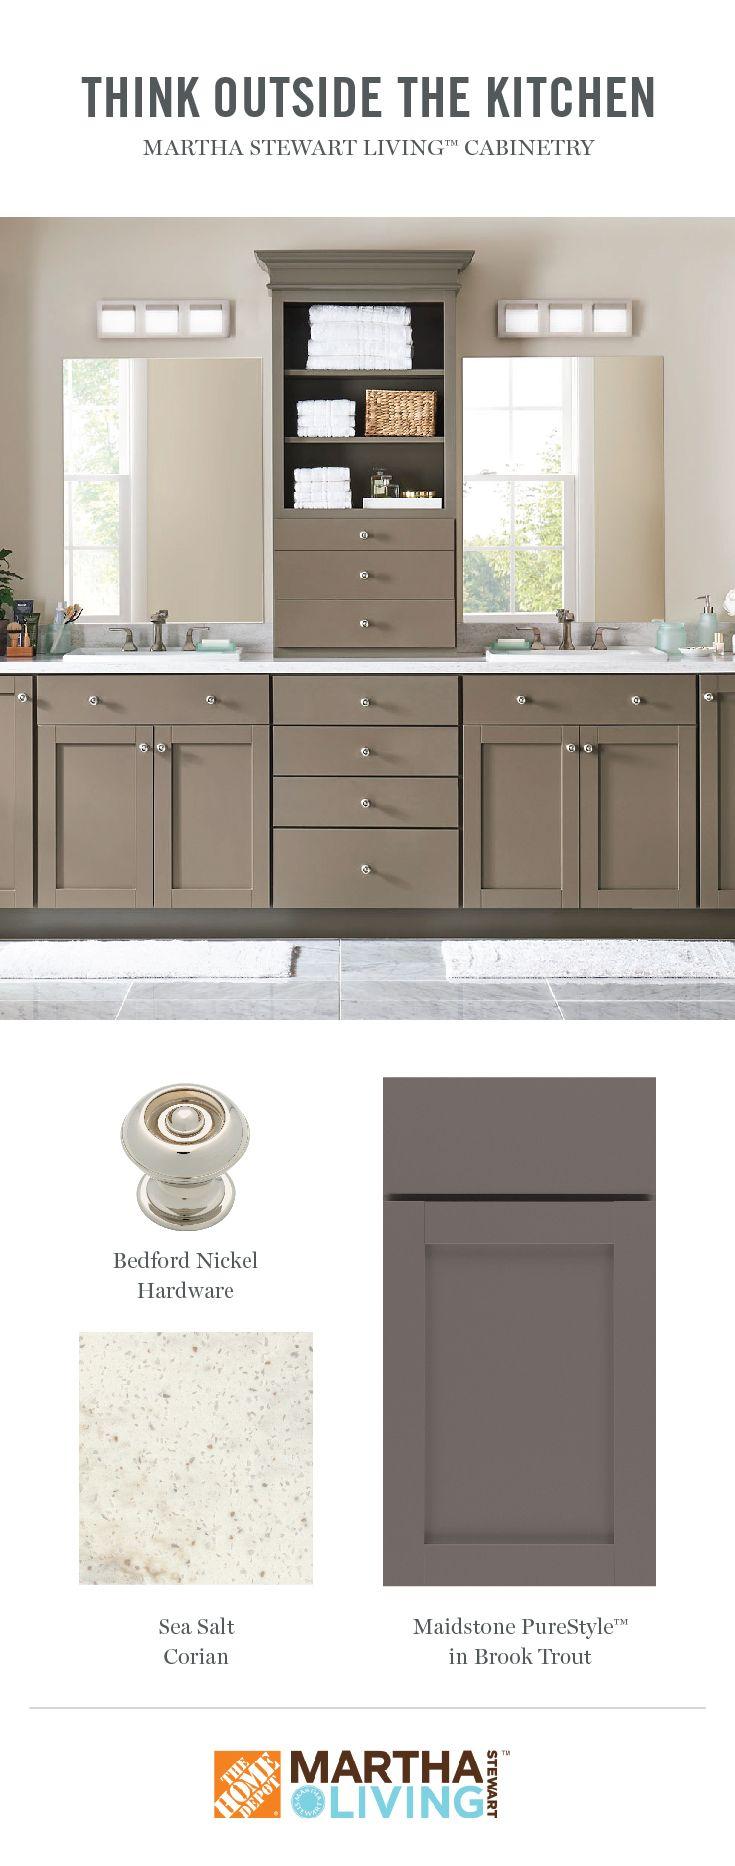 Martha Stewart Living Kitchens At The Home Depot Home Depot Bathroom Kitchen Cabinet Storage Solutions Kitchen Cabinet Storage